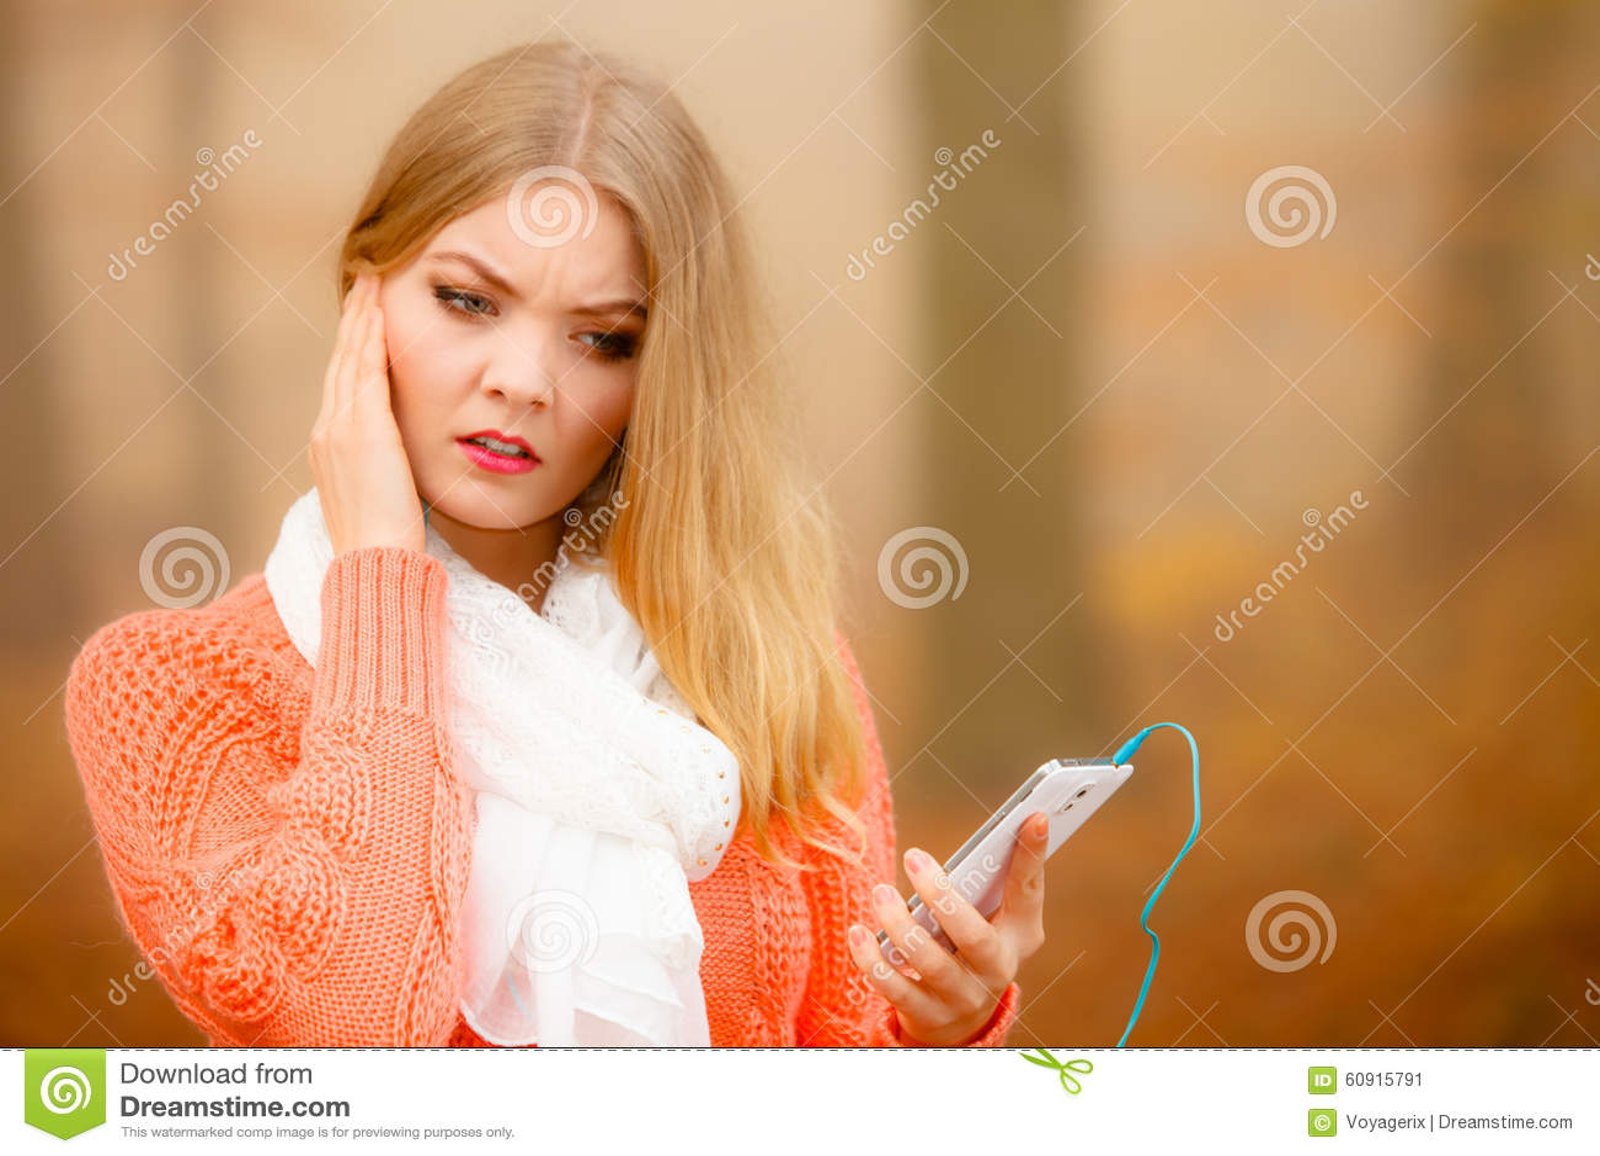 Annoyed Girl Listening Music Mp3 Stock Image - Image of